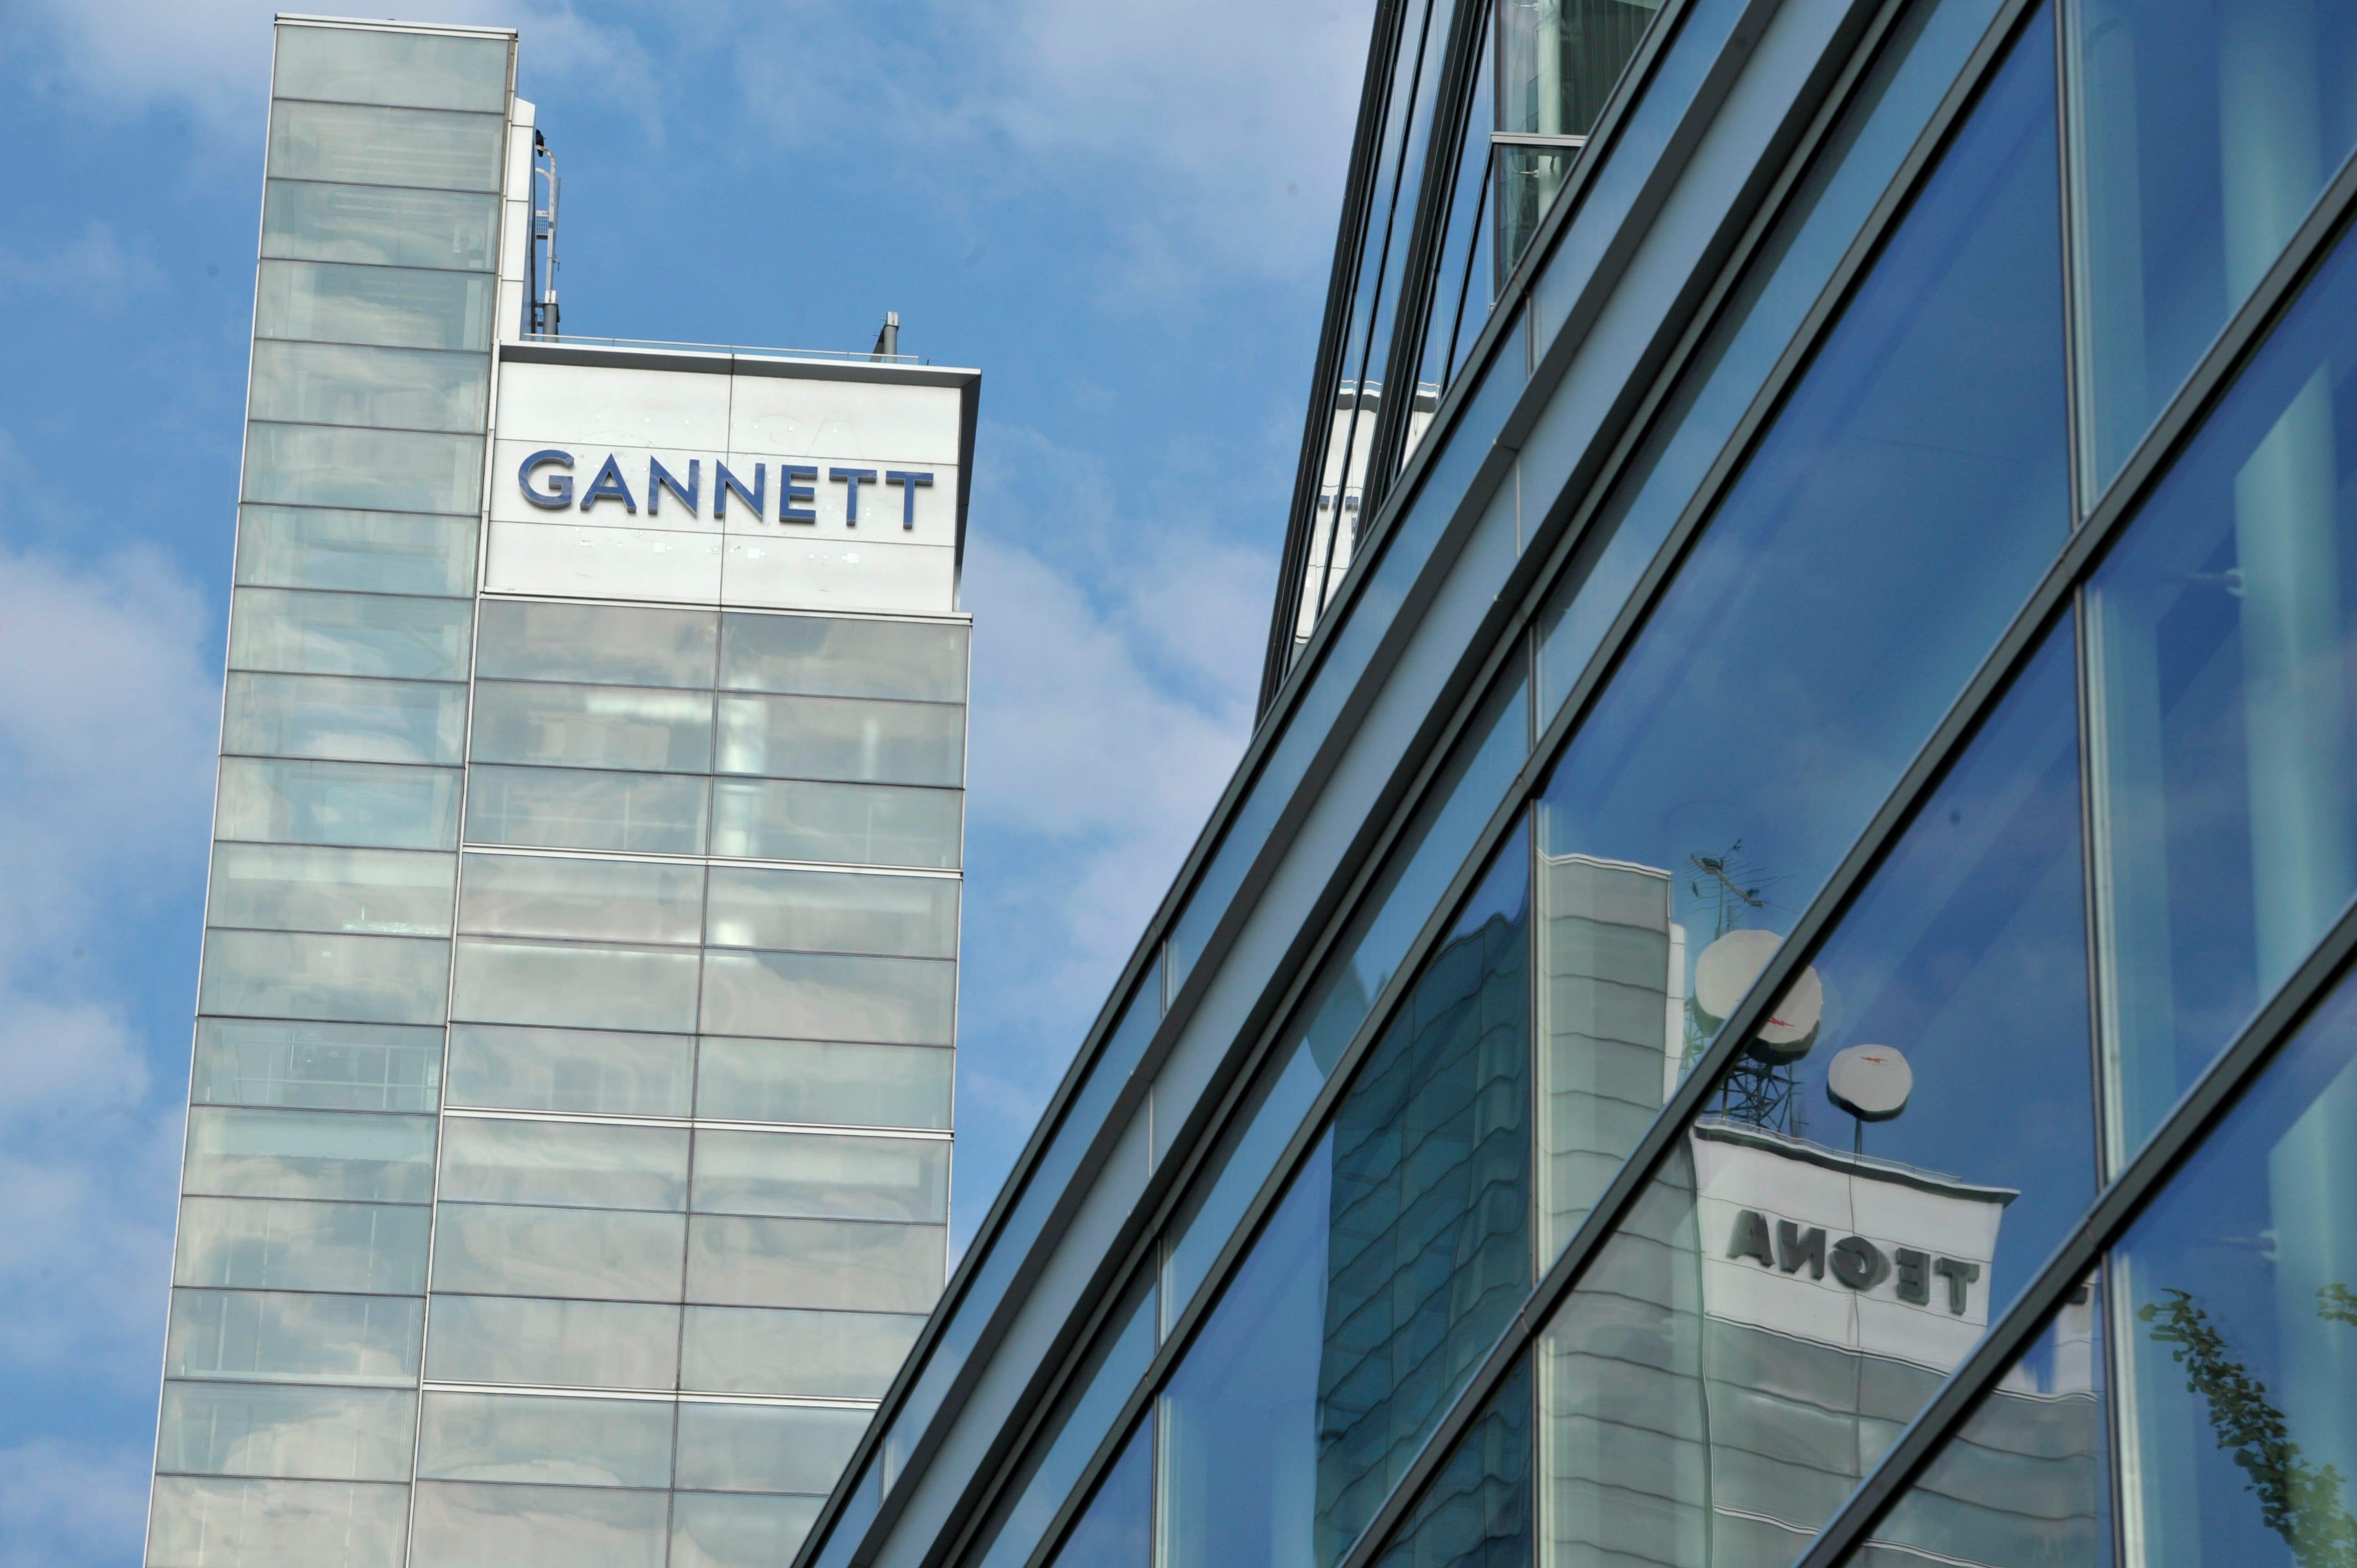 10/8/2015, McLean, VA. Gannett headquarters building